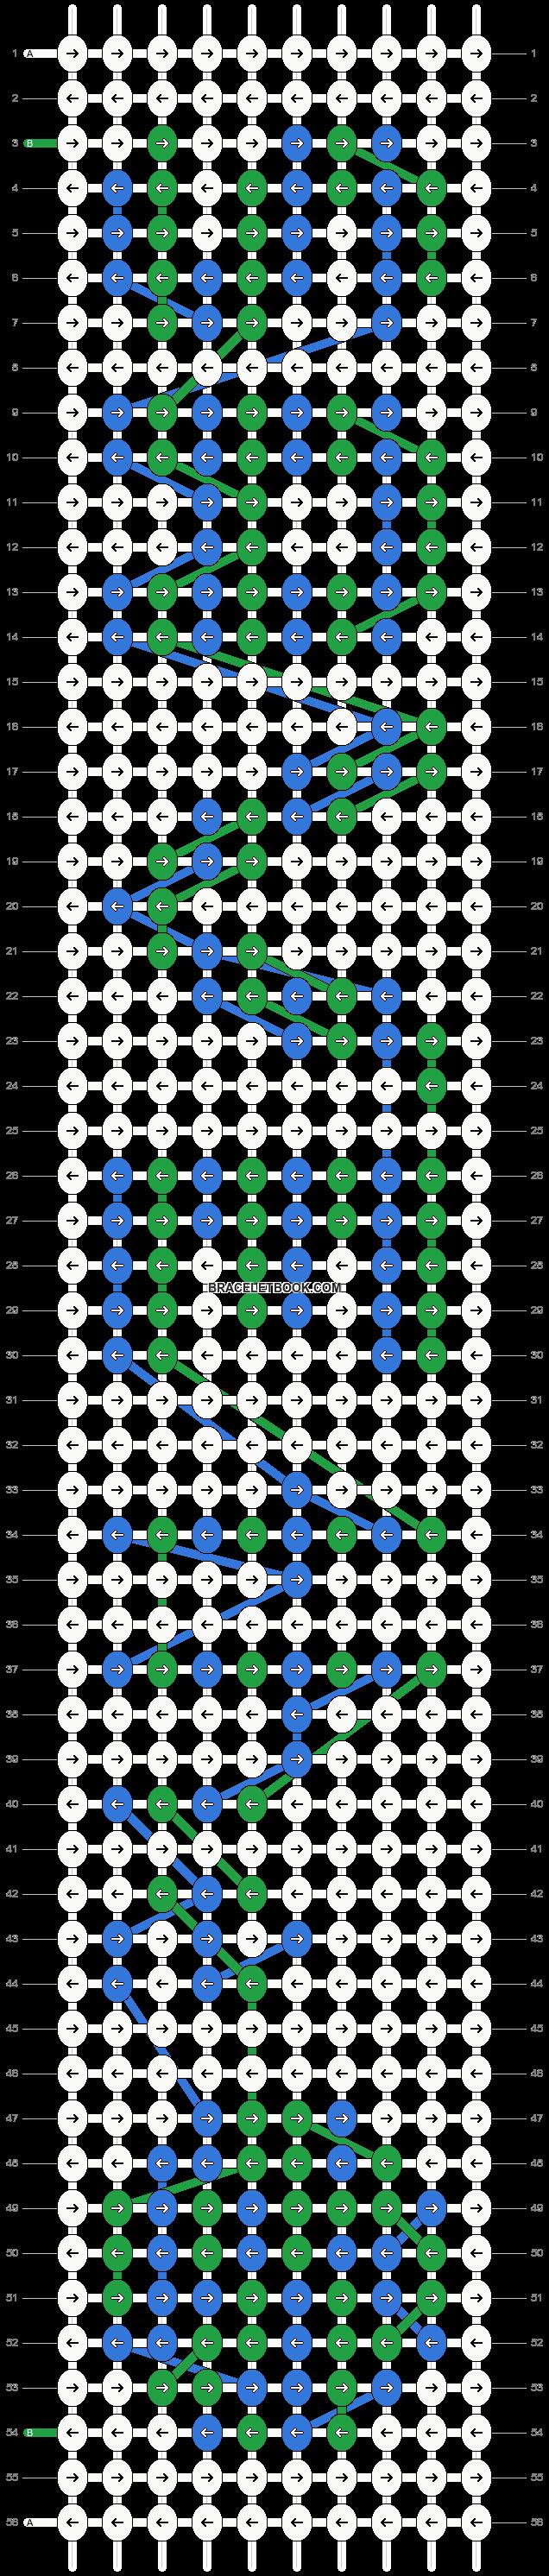 Alpha pattern #1930 pattern